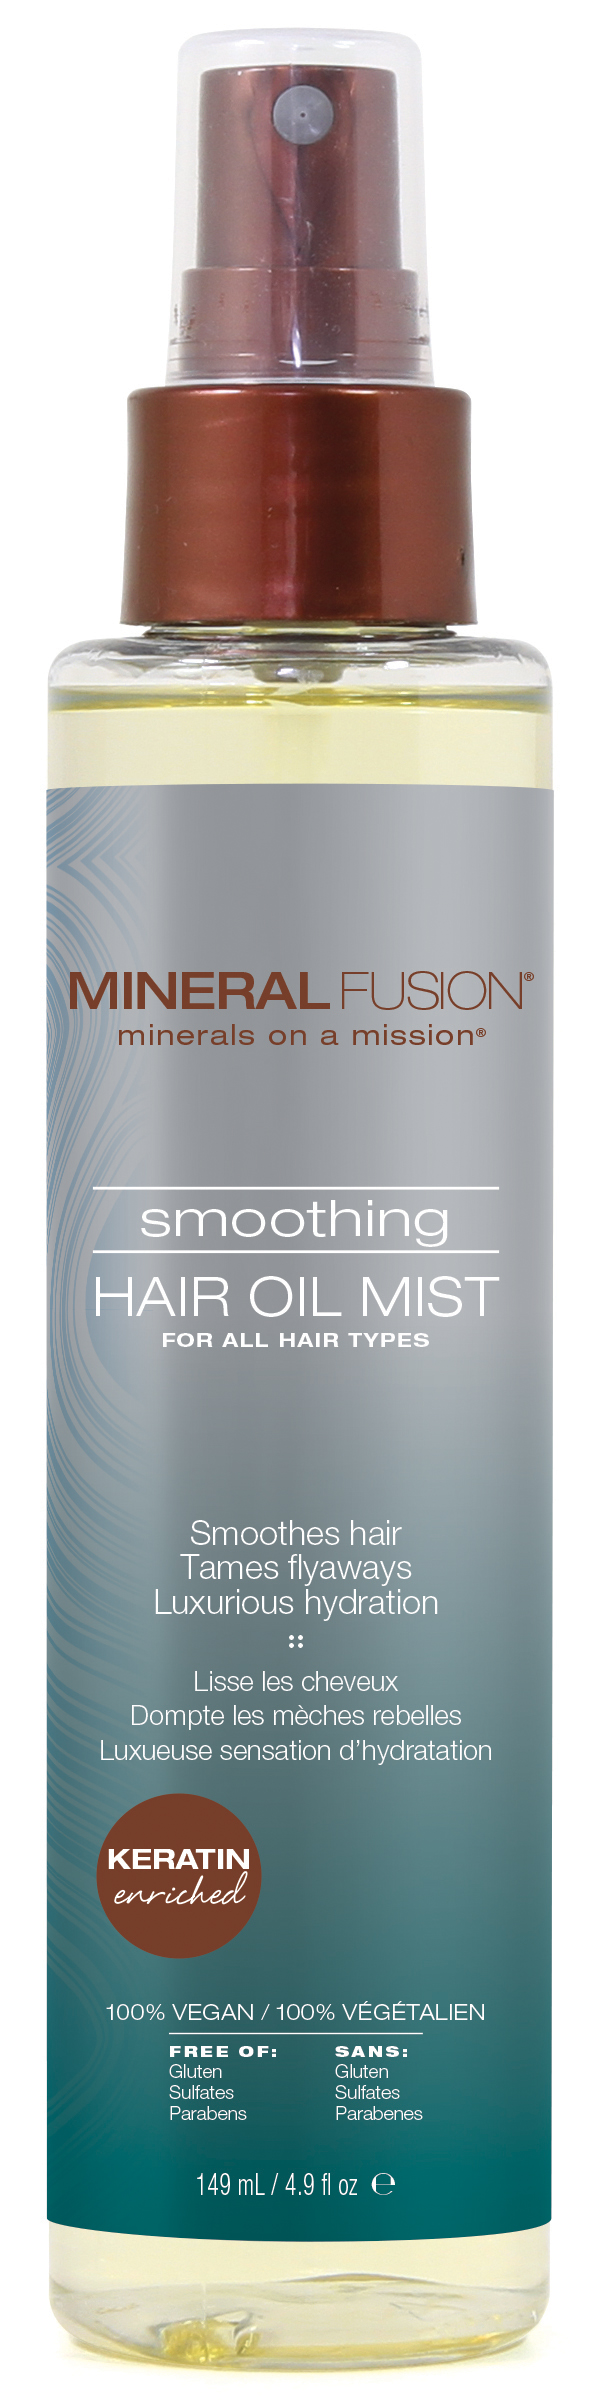 MF Hair Spray SMOOTHINGt.jpg